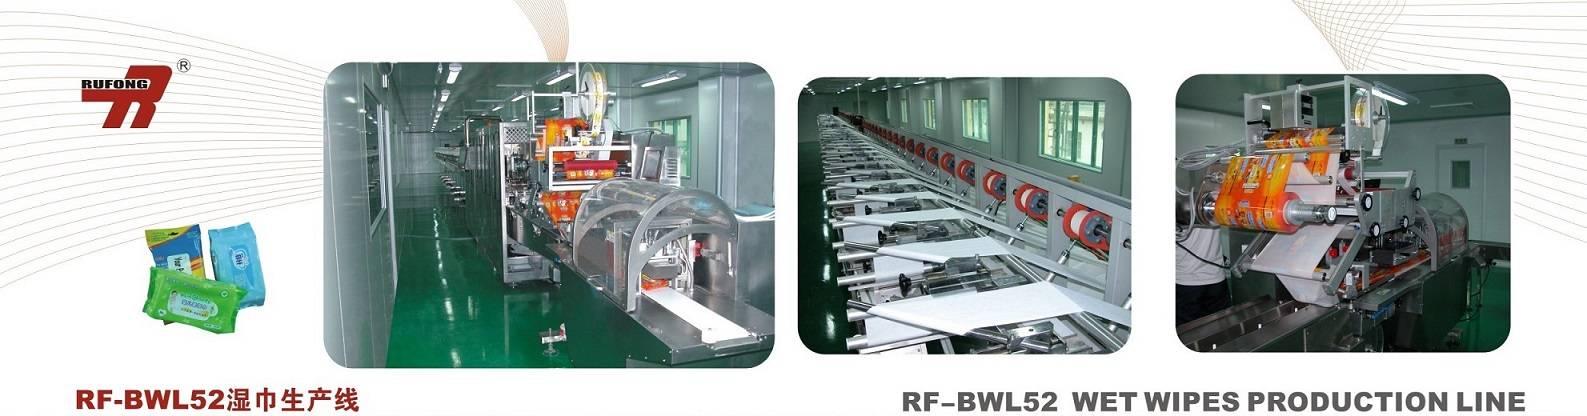 RF-BWL52 Wet Wipes Production Line